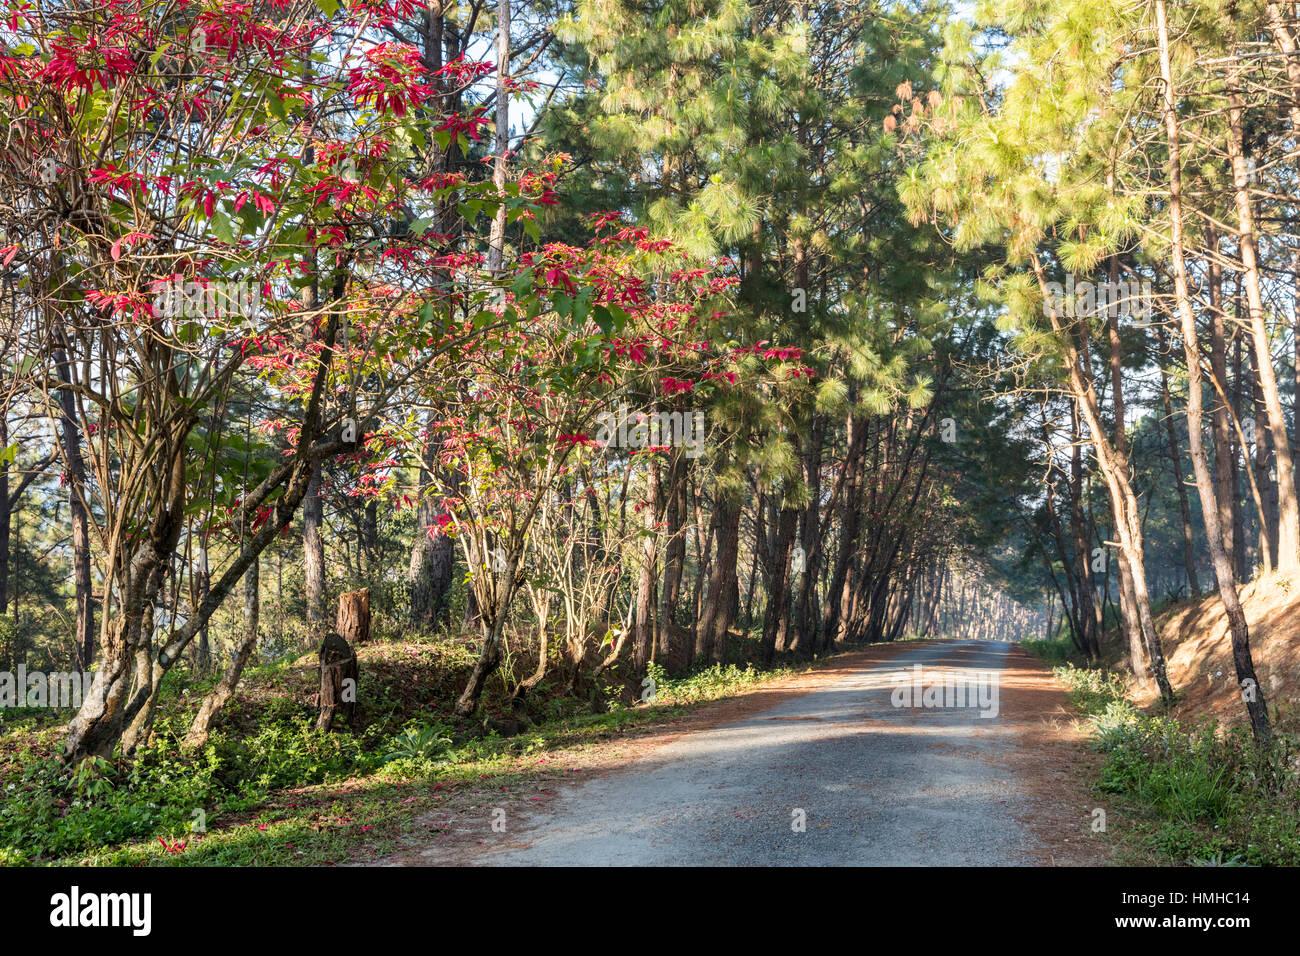 Albero strada ombreggiata con Poinsettias nelle colline sopra Phonsevan, Laos Foto Stock